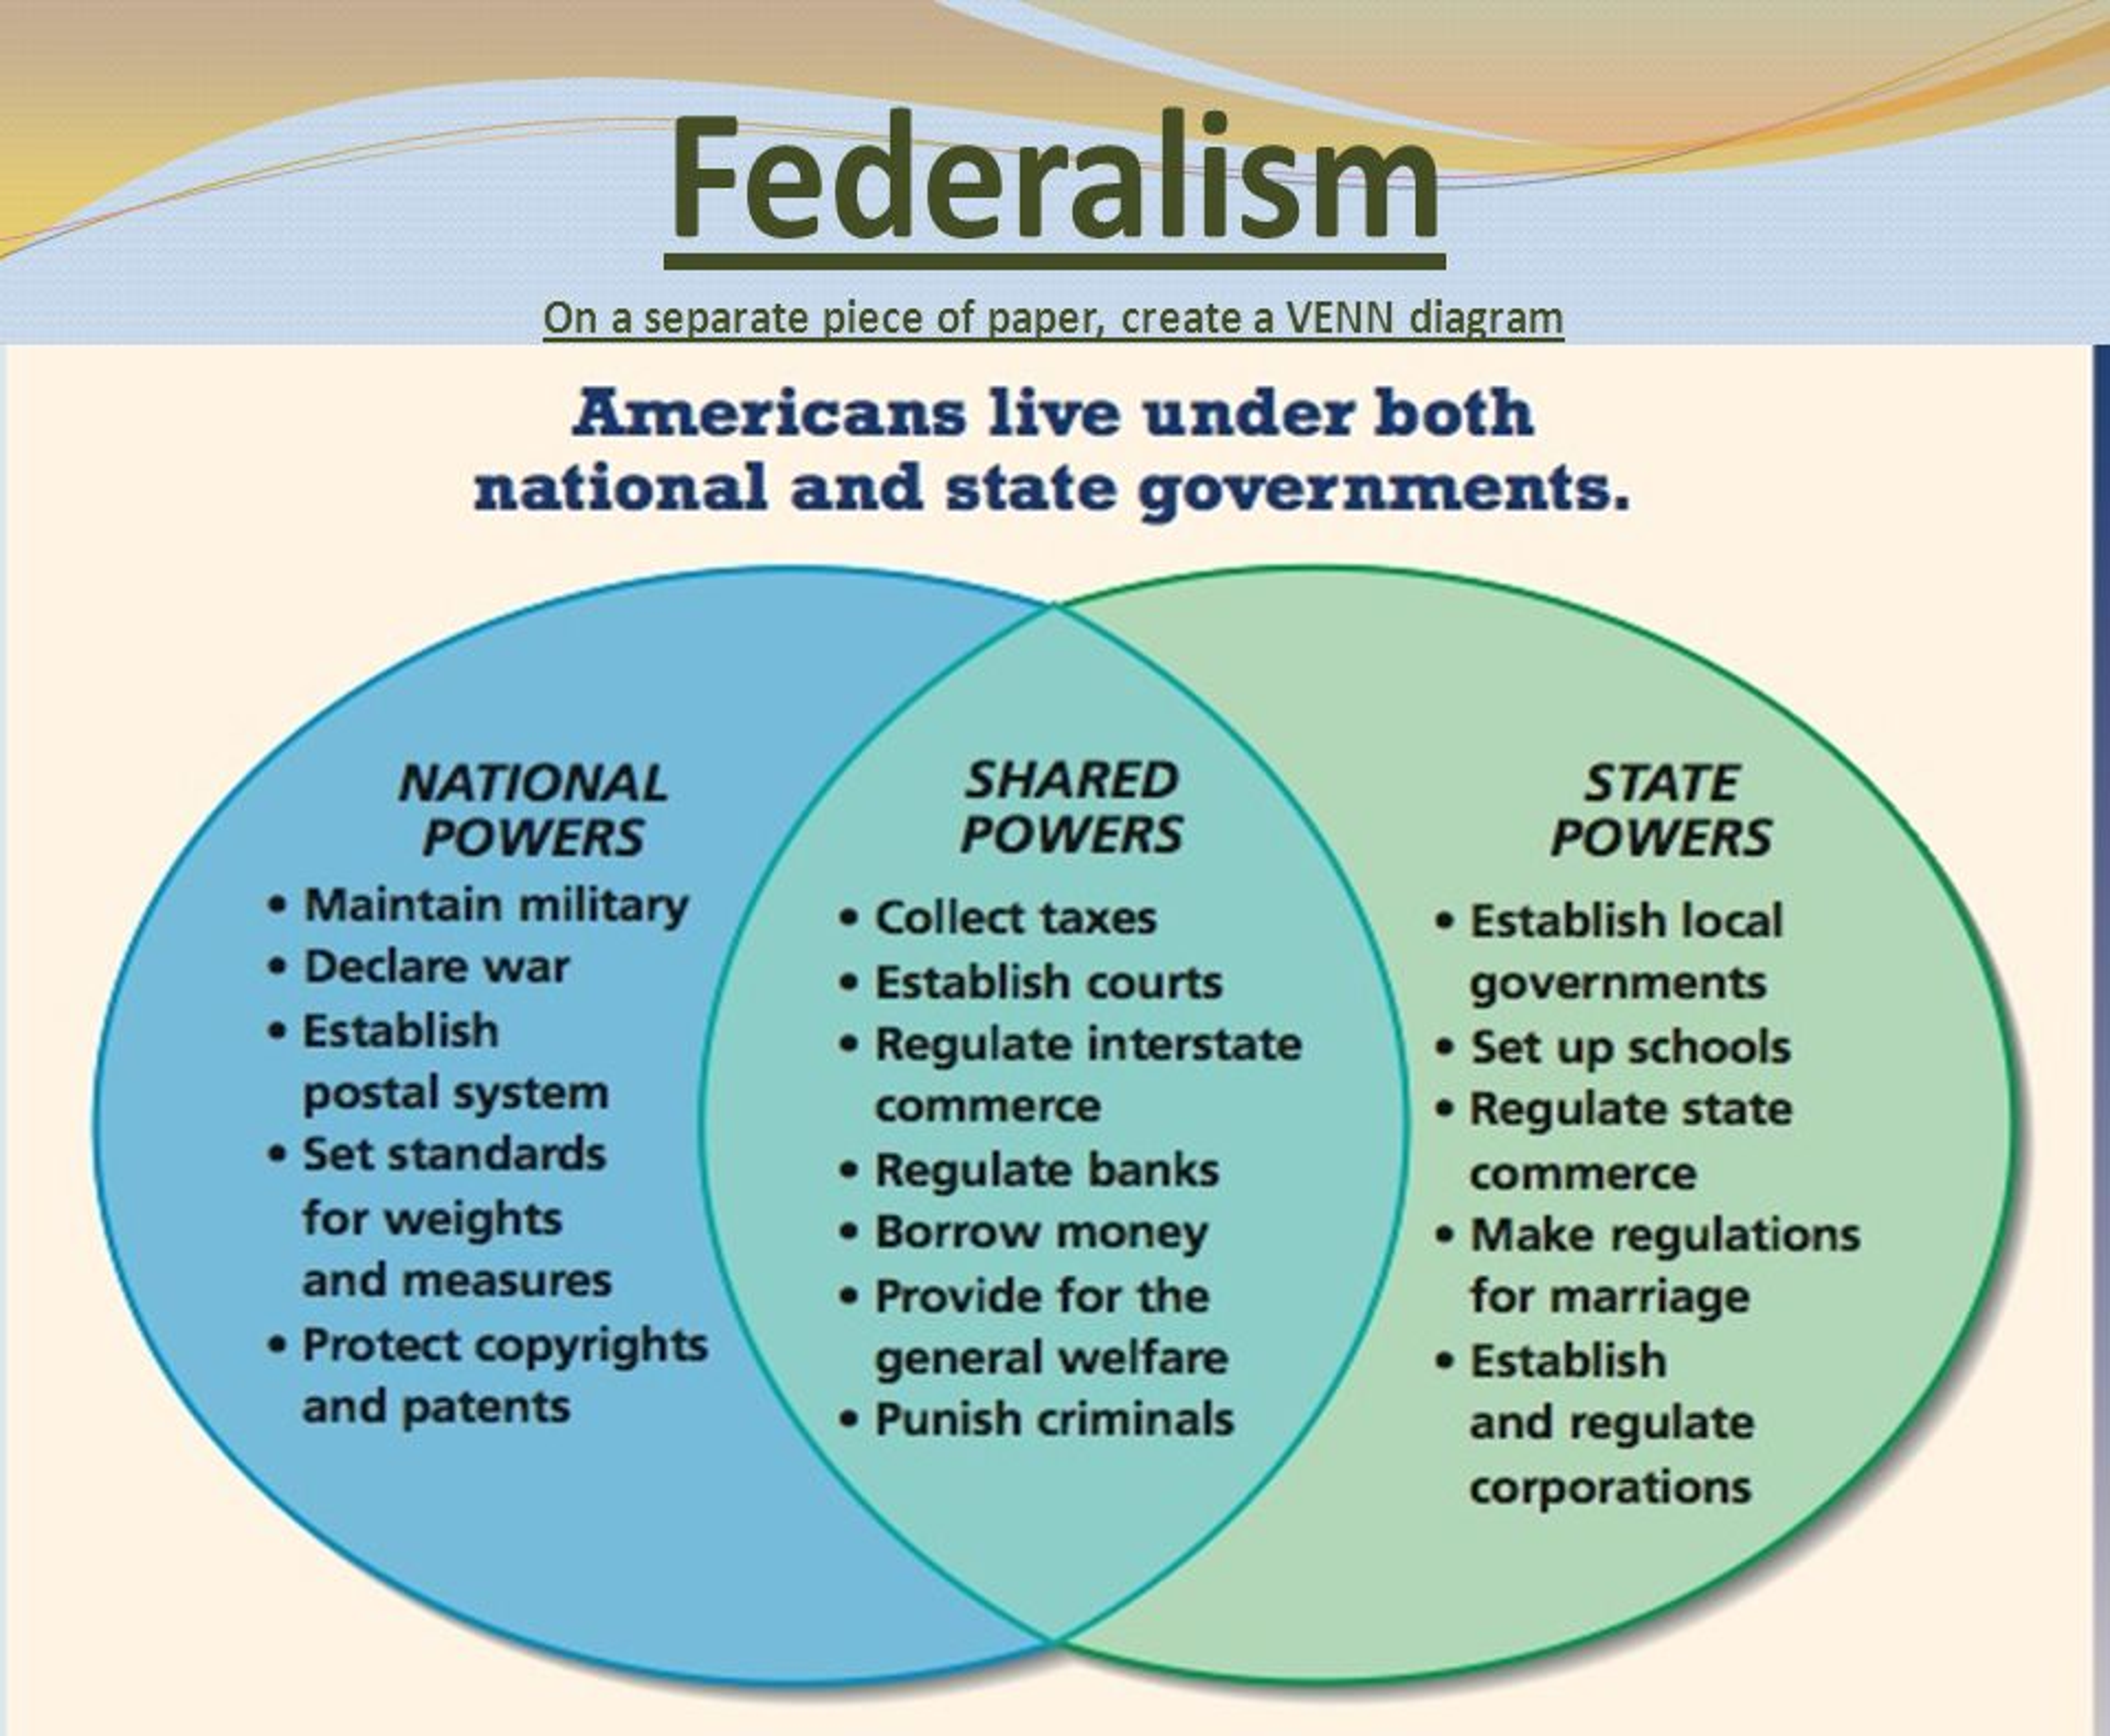 federalists vs anti federalists venn diagram